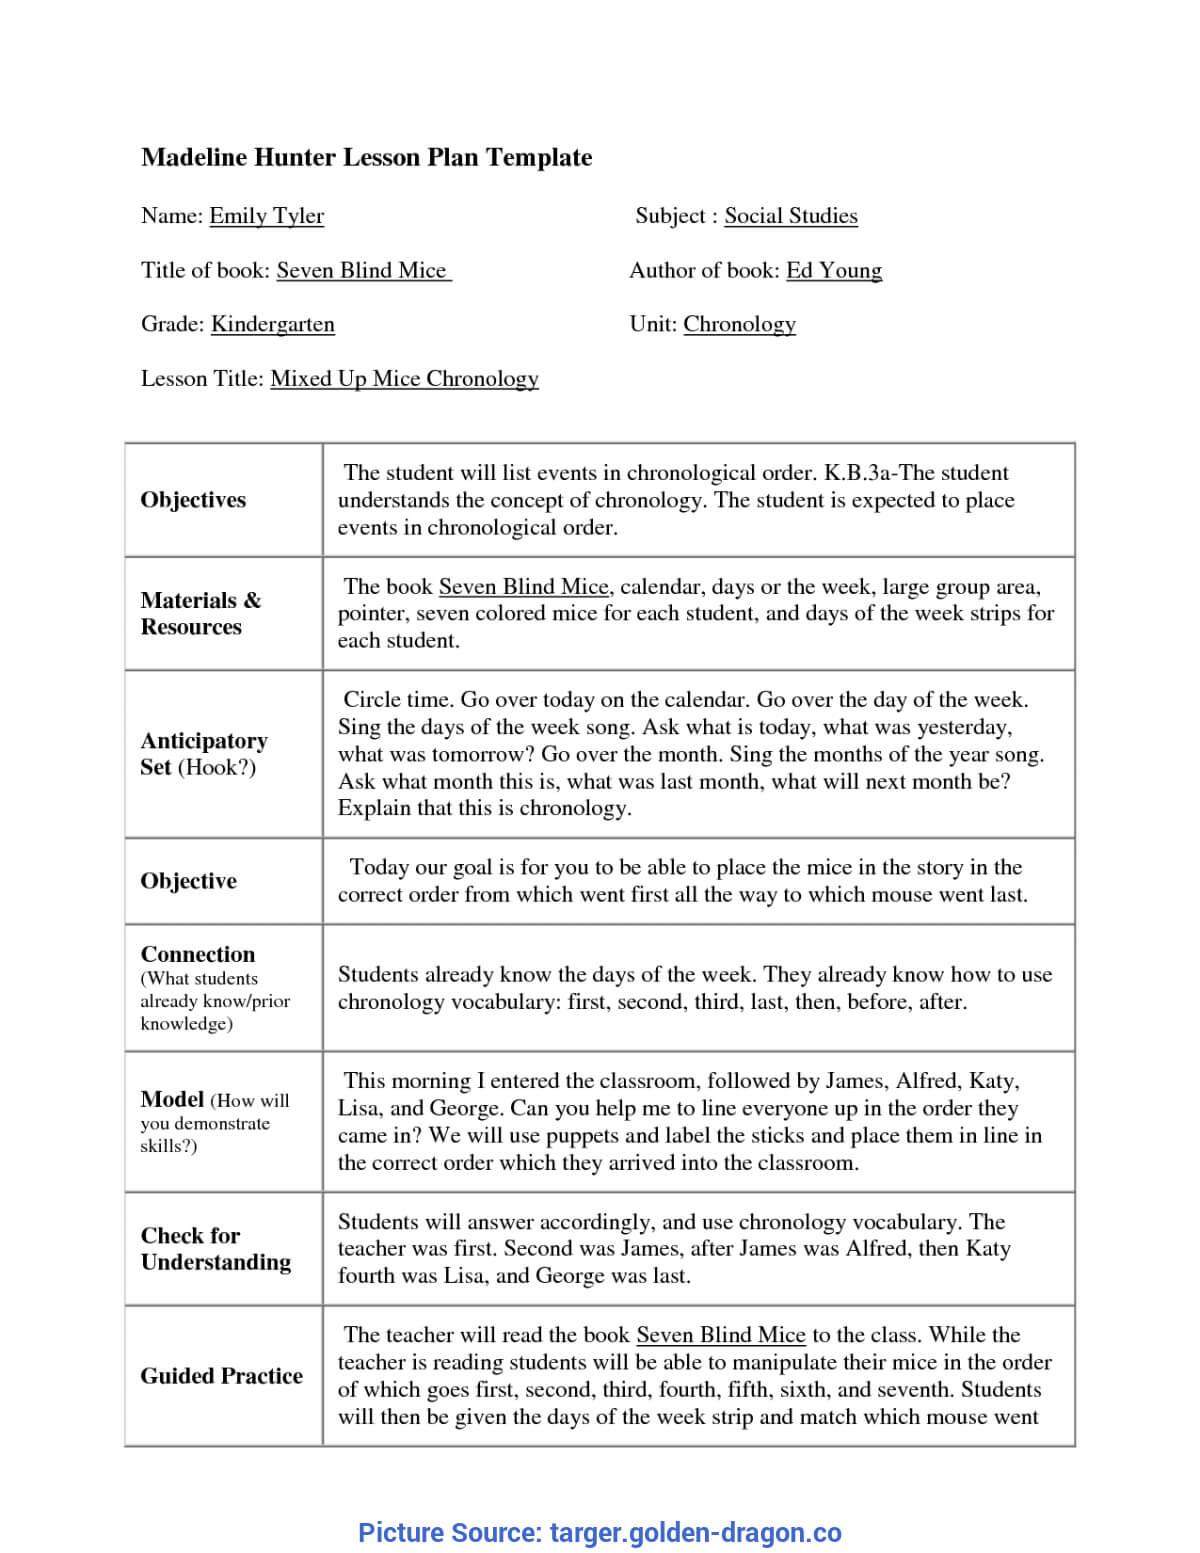 Top Madeline Hunter Lesson Plan Kindergarten Madeline Hunter Throughout Madeline Hunter Lesson Plan Template Blank